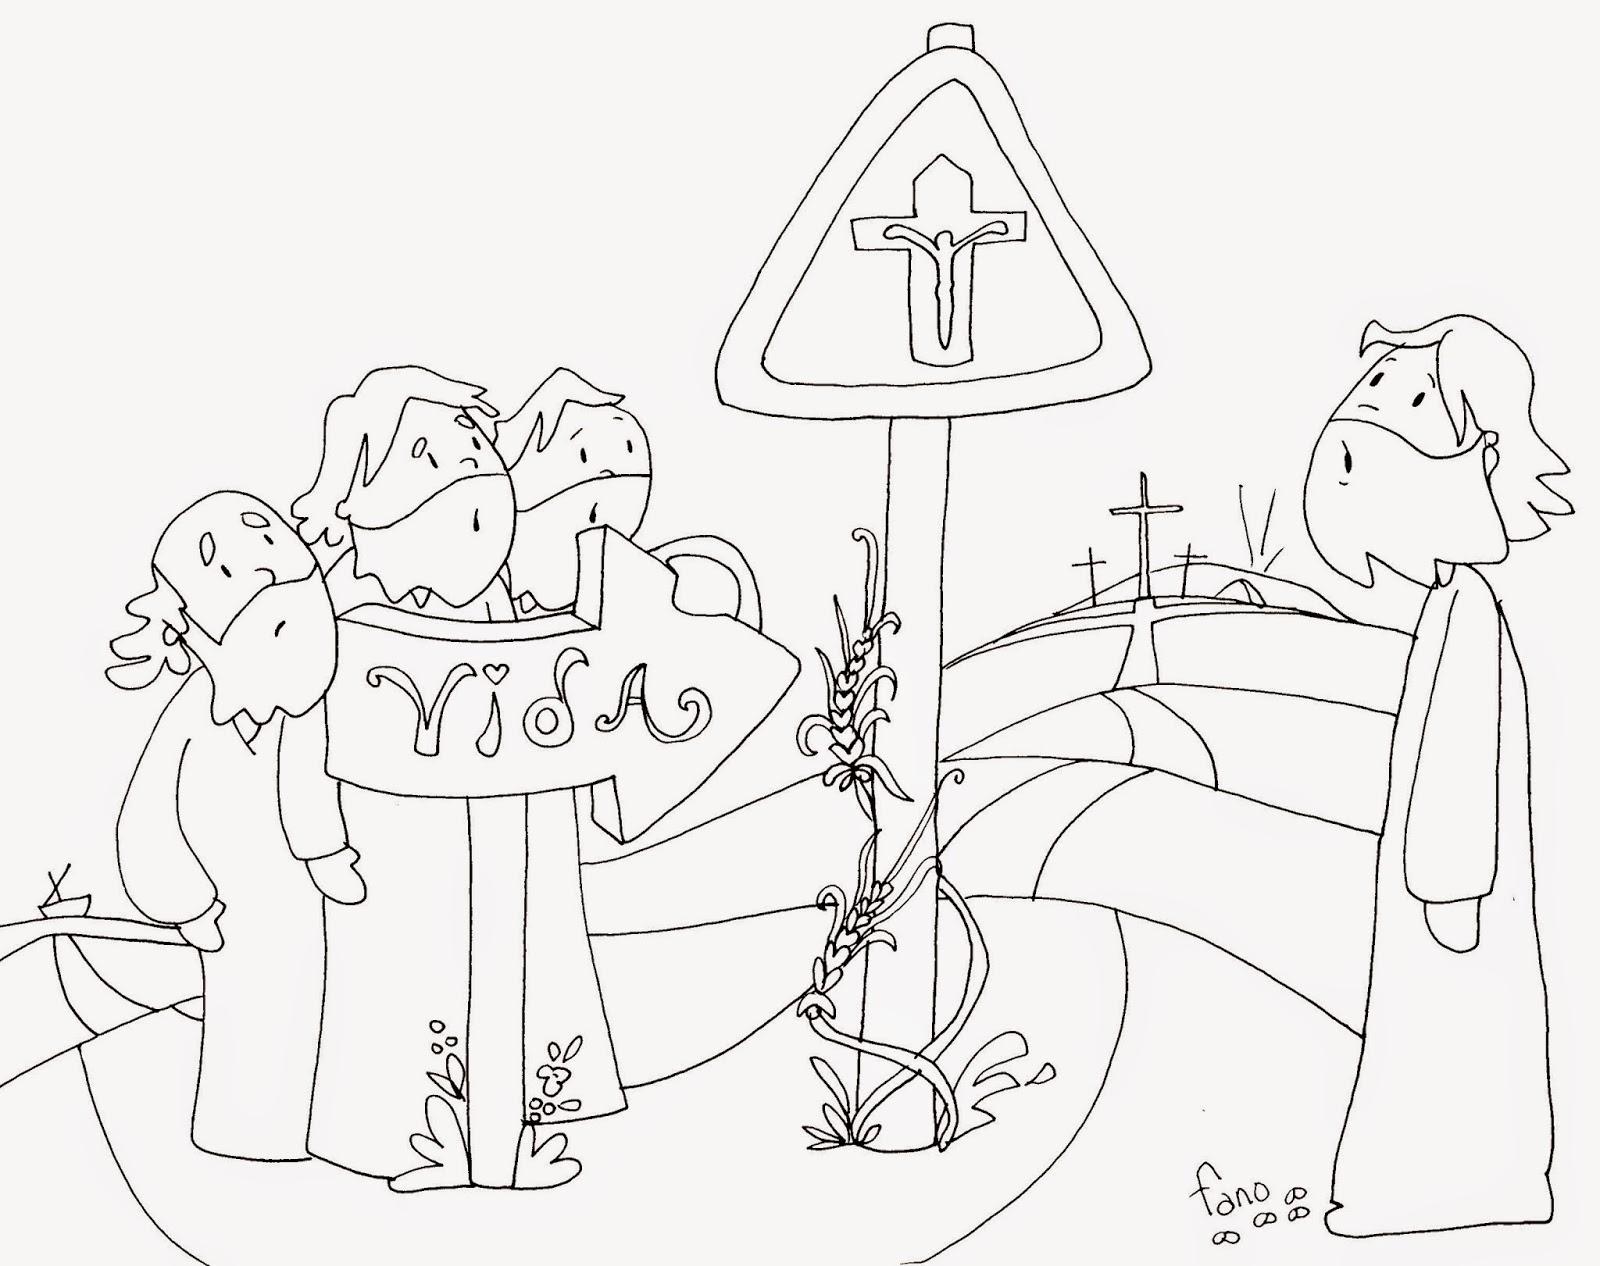 La Catequesis El Blog De Sandra Dibujos De Patxi Fano